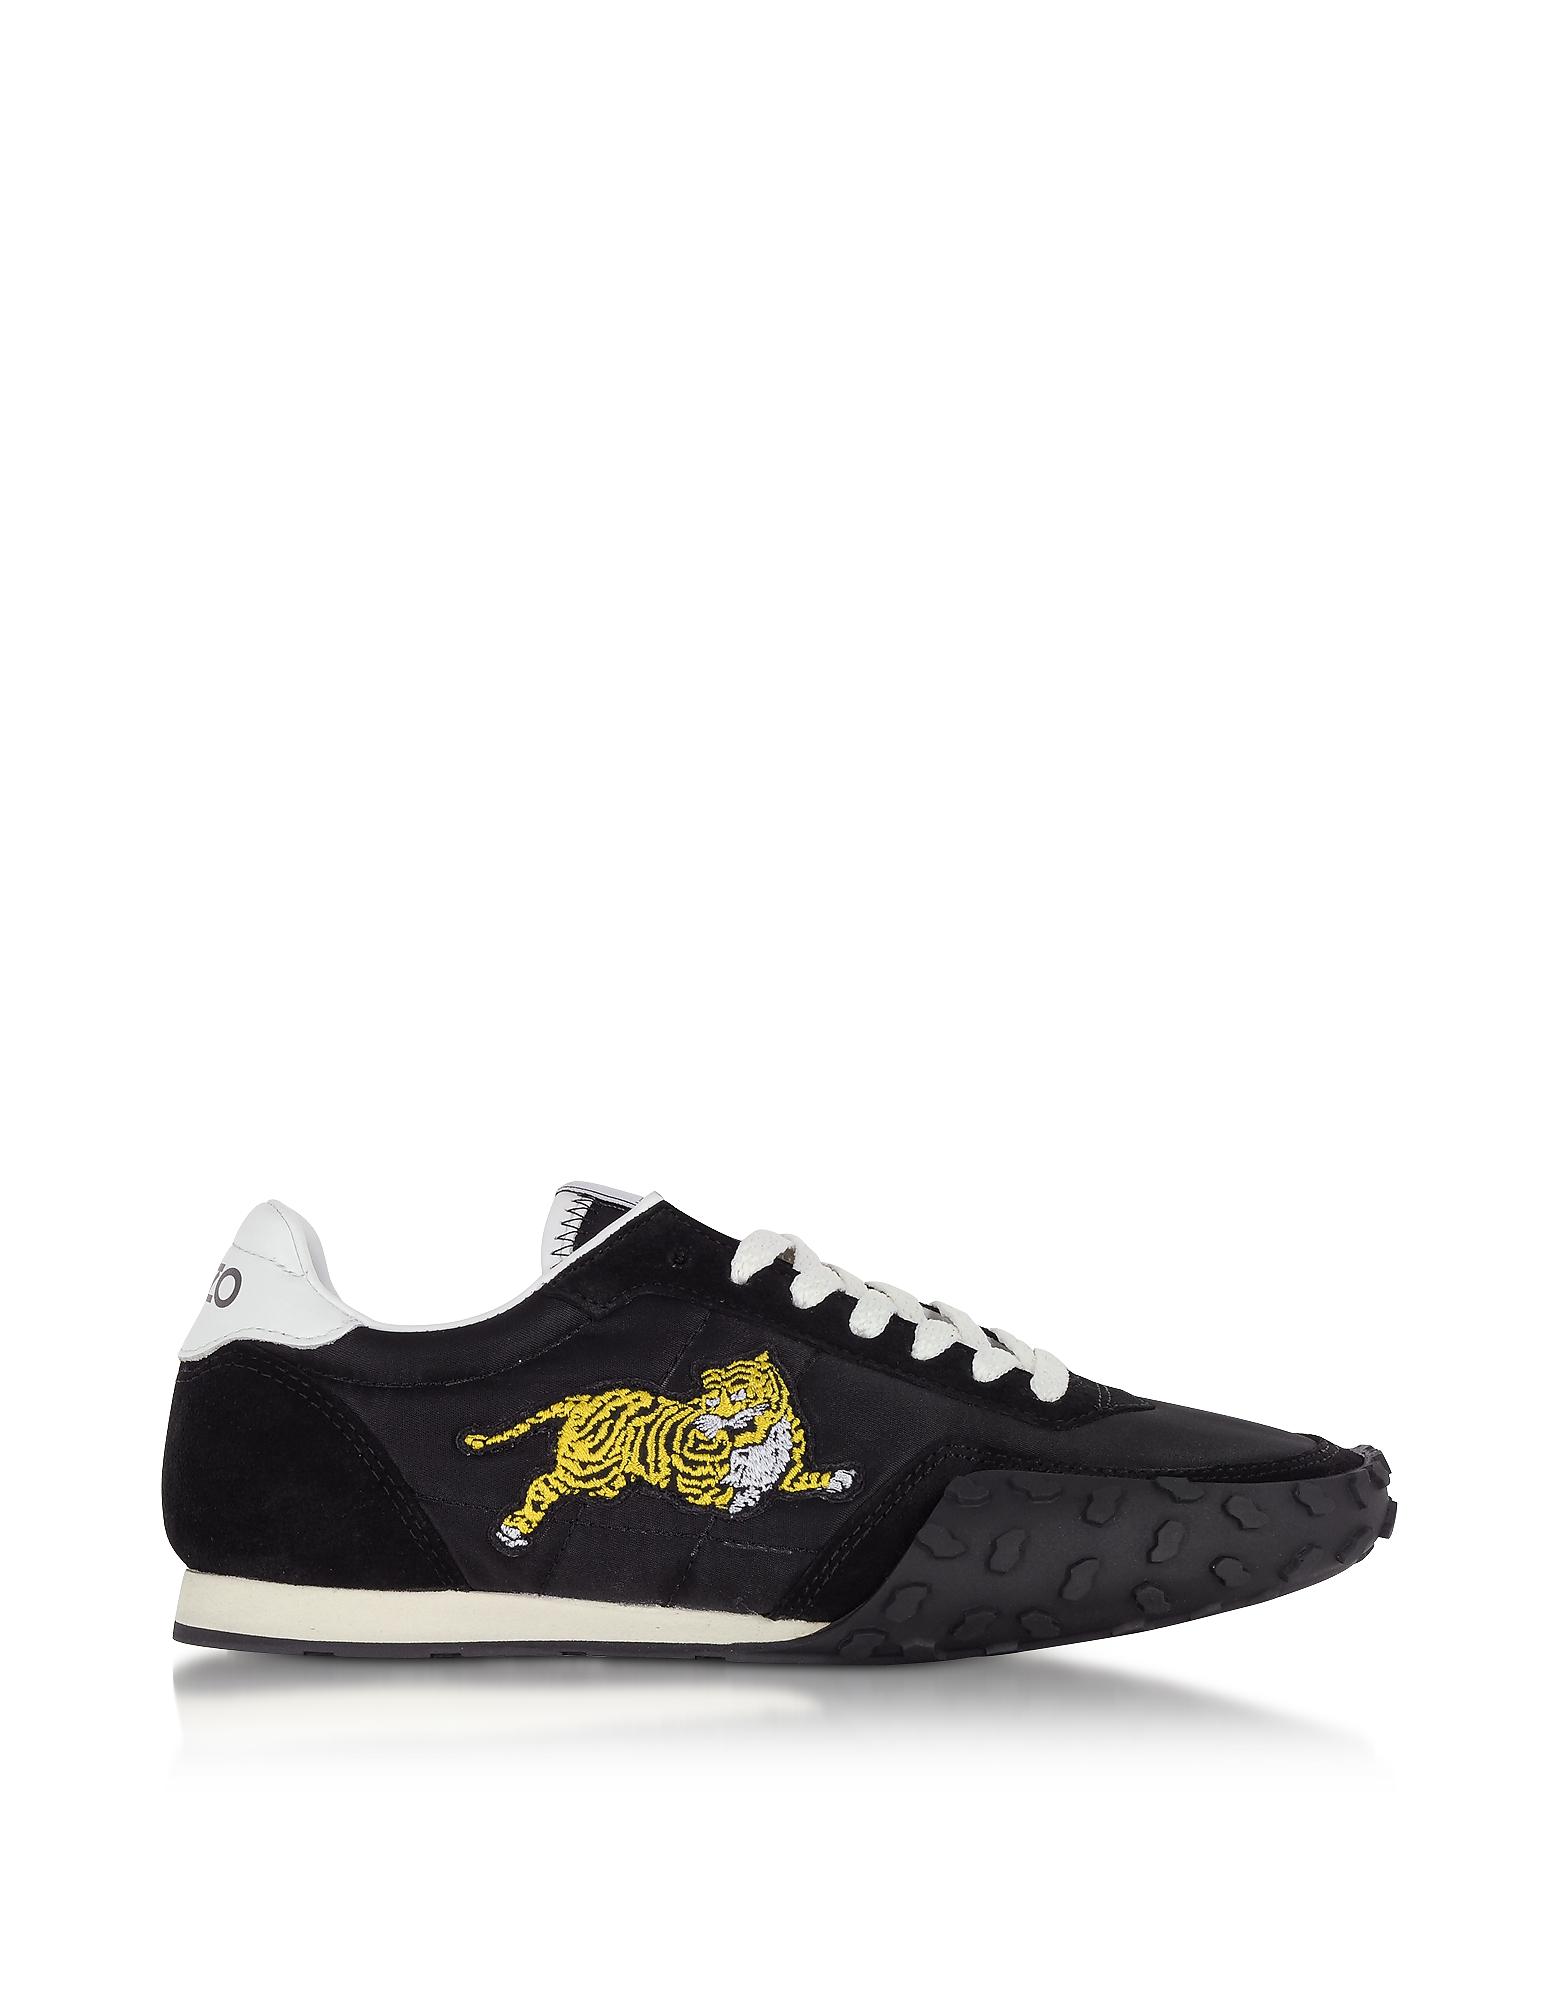 Kenzo Shoes, Black Nylon Kenzo Move Women's Sneakers